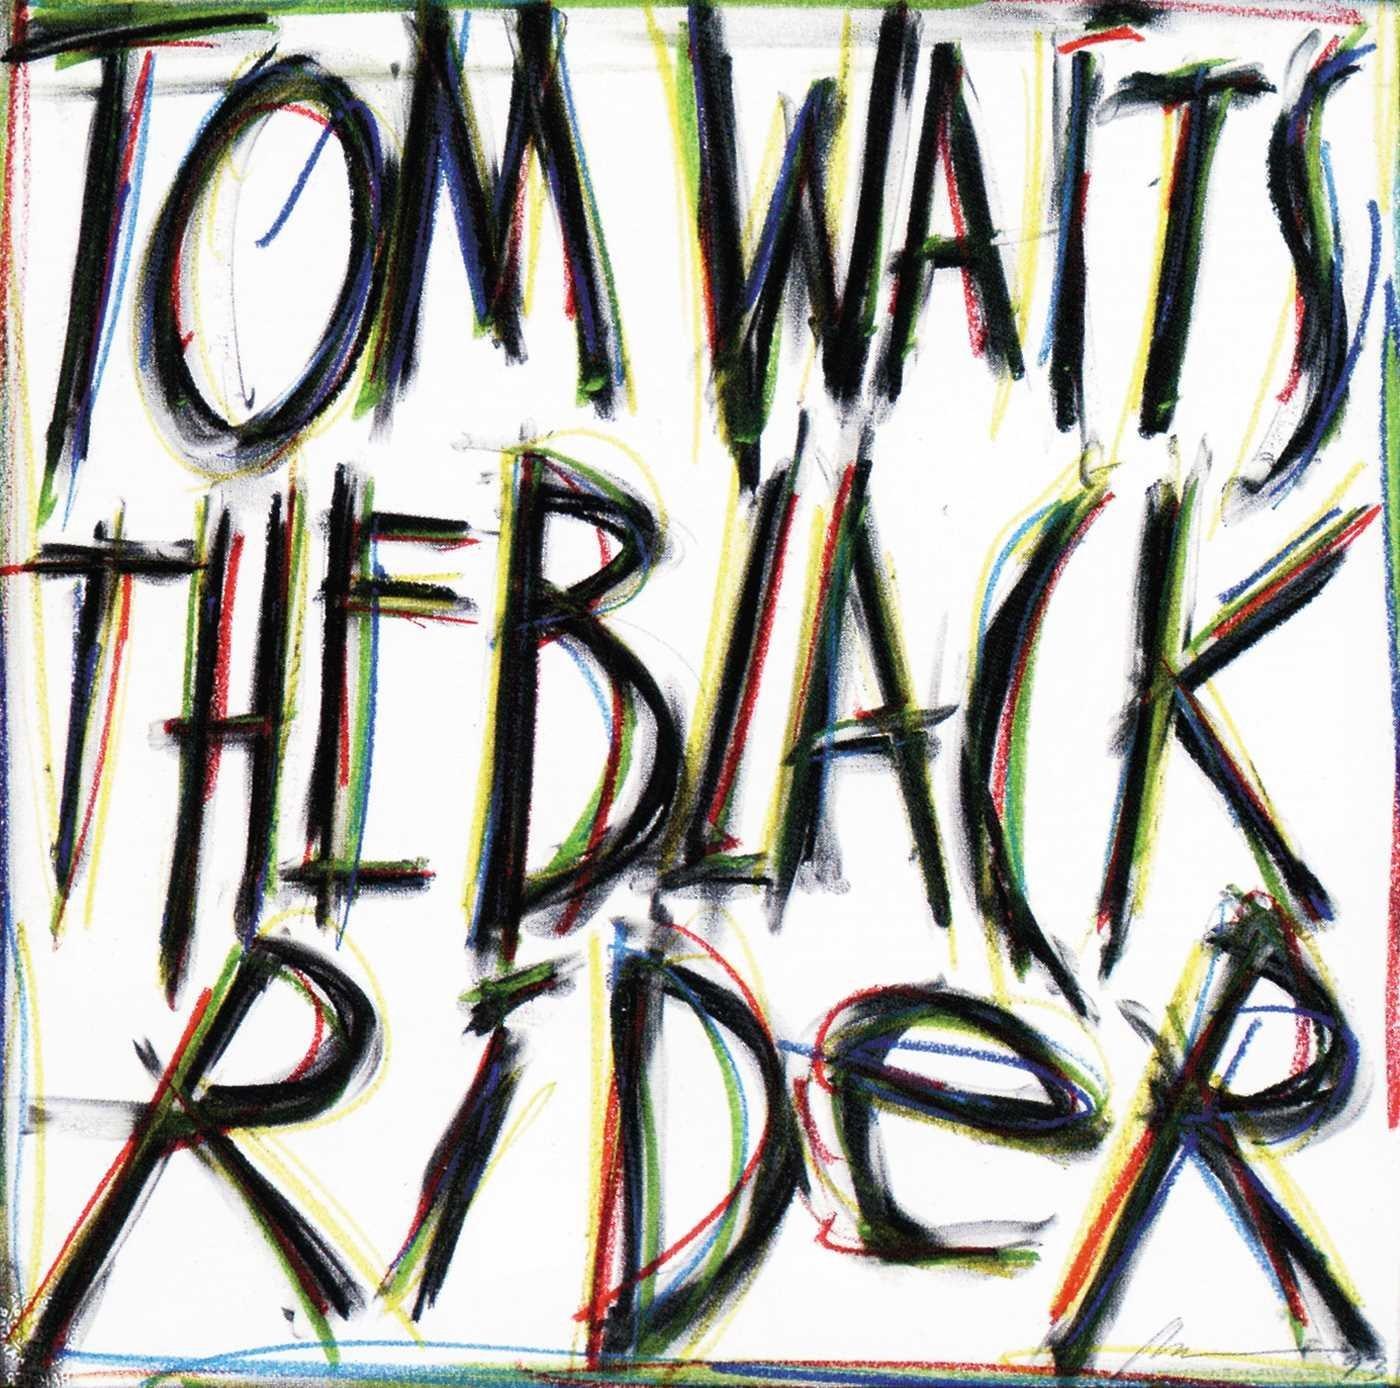 「November」収録アルバム『The Black Rider』/Tom Waits